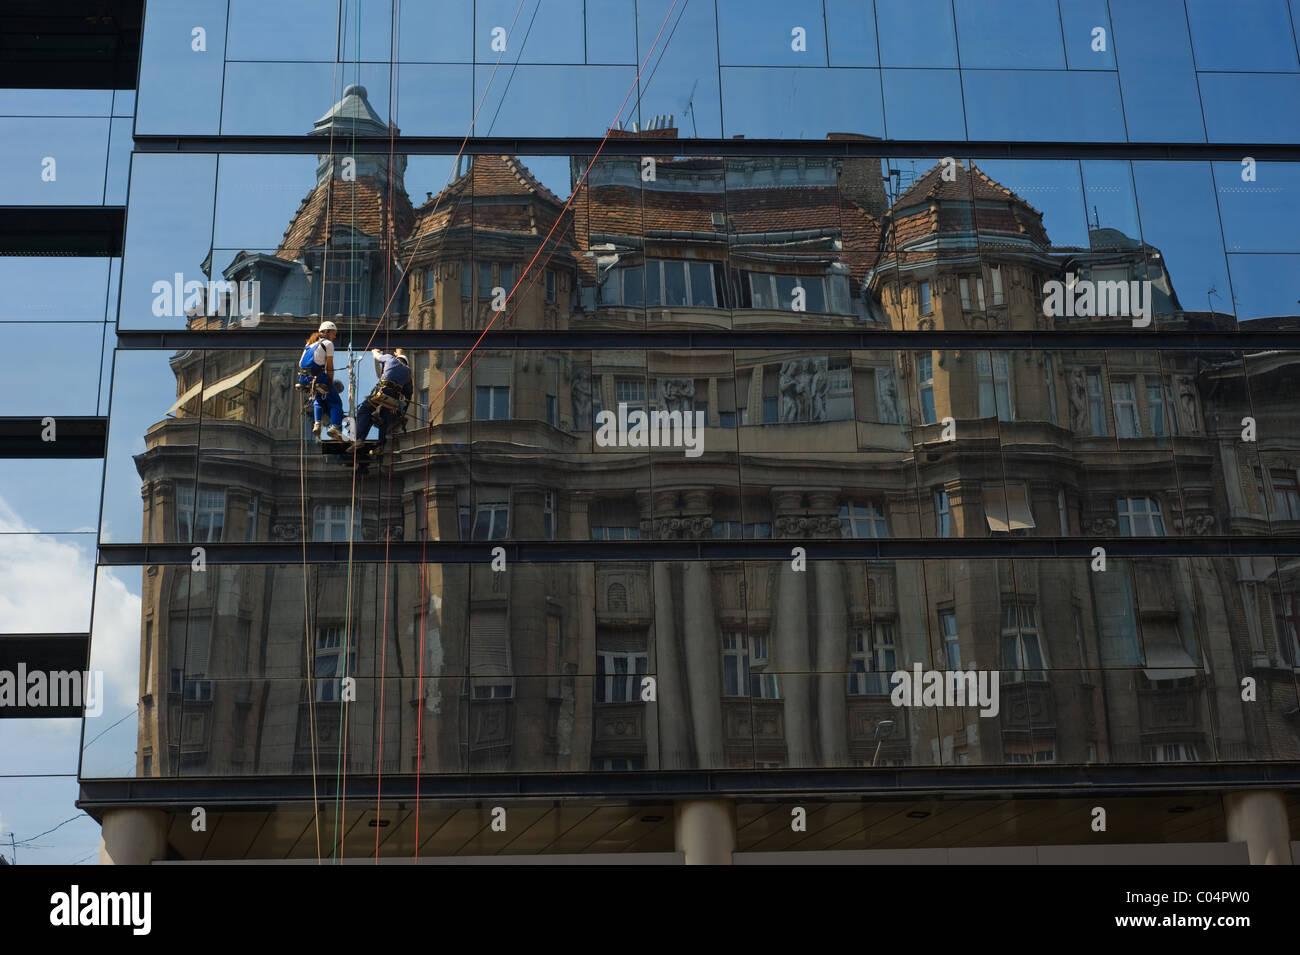 Modern Building In Budapest Hungary Reflecting Older Art